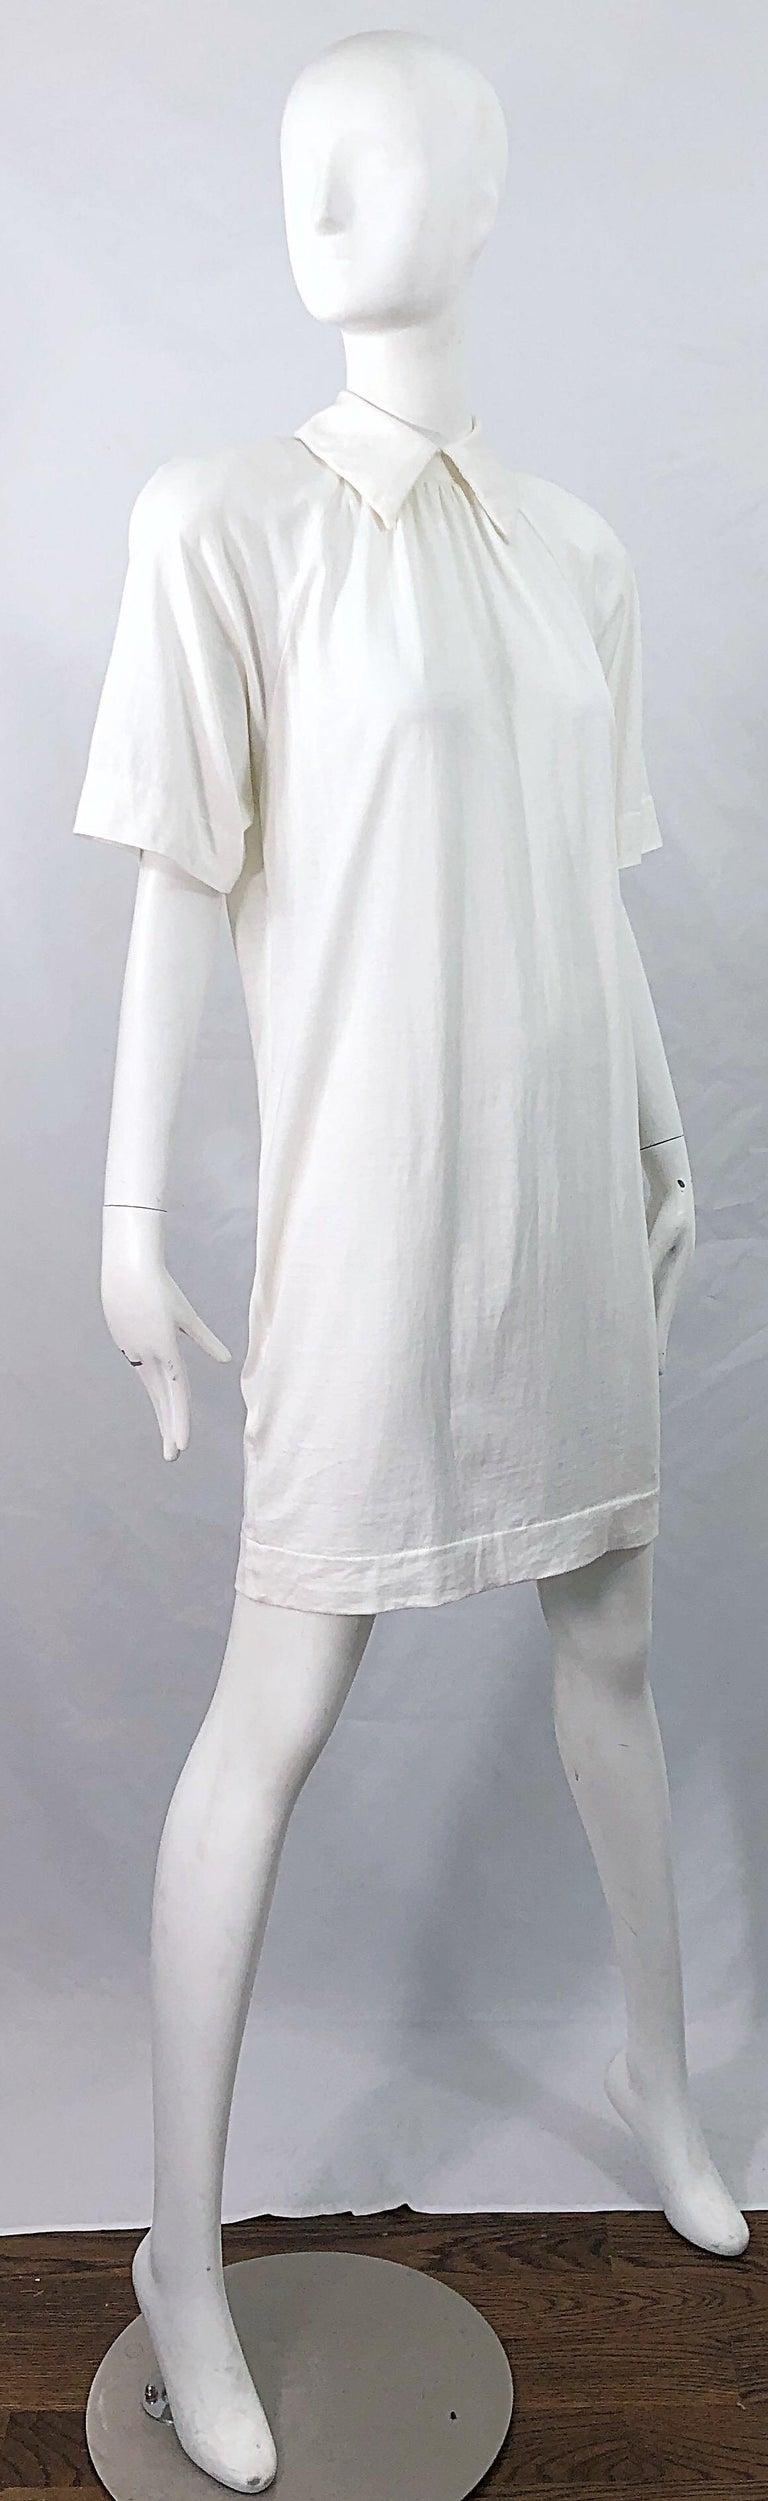 Women's 1990s James Purcell Size 6 / 8 White Cotton Vintage 90s T-Shirt Dress For Sale